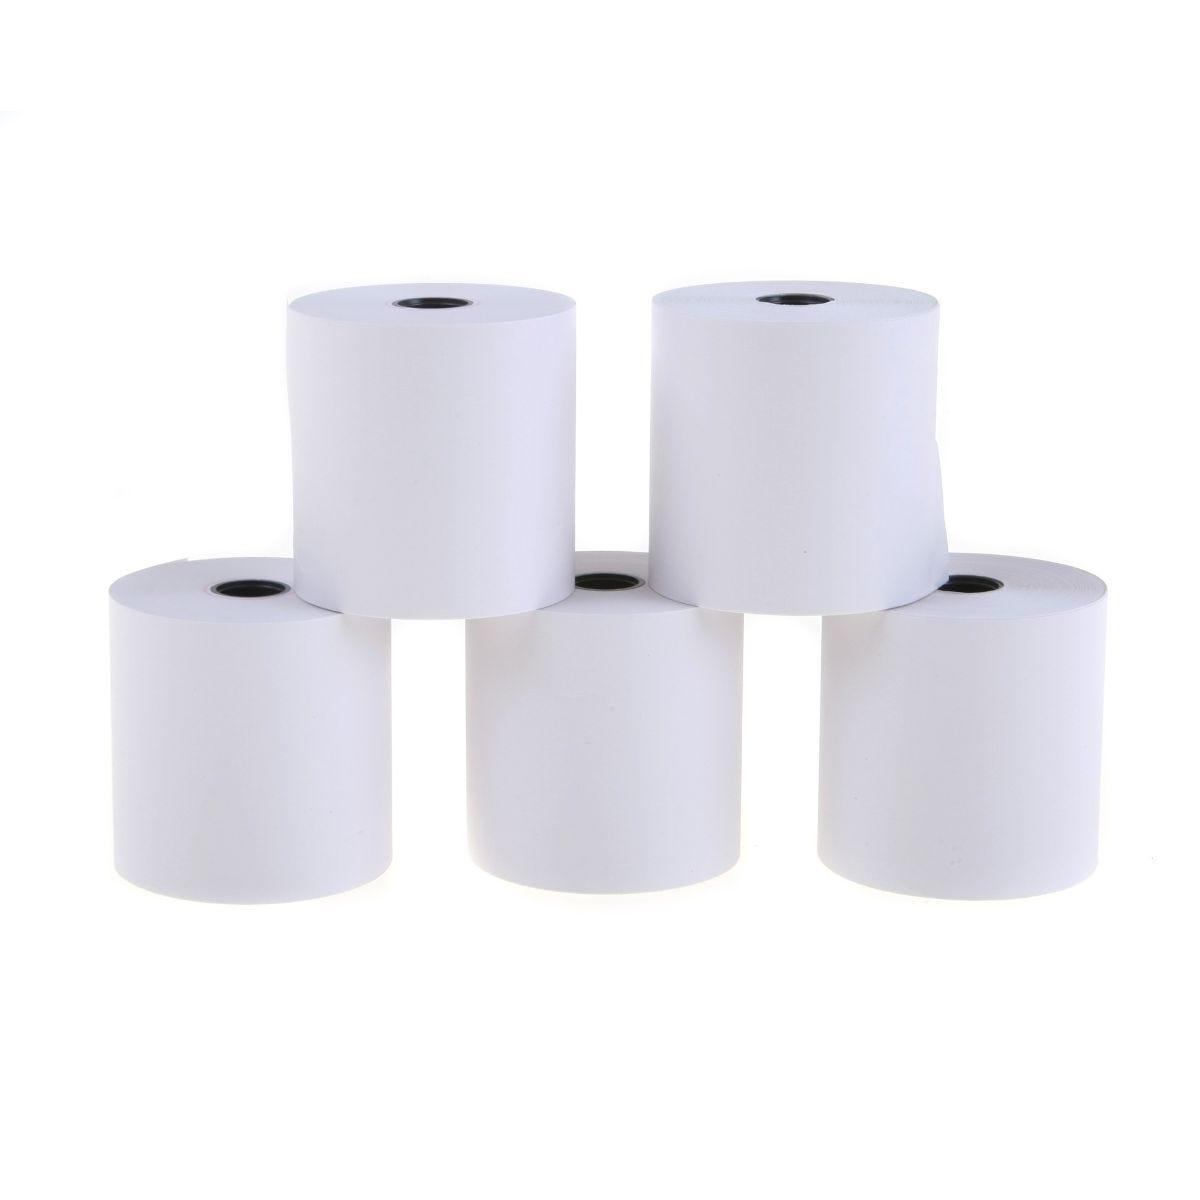 Ryman Adding Machine Rolls Pack of 5 57x57x12mm, White